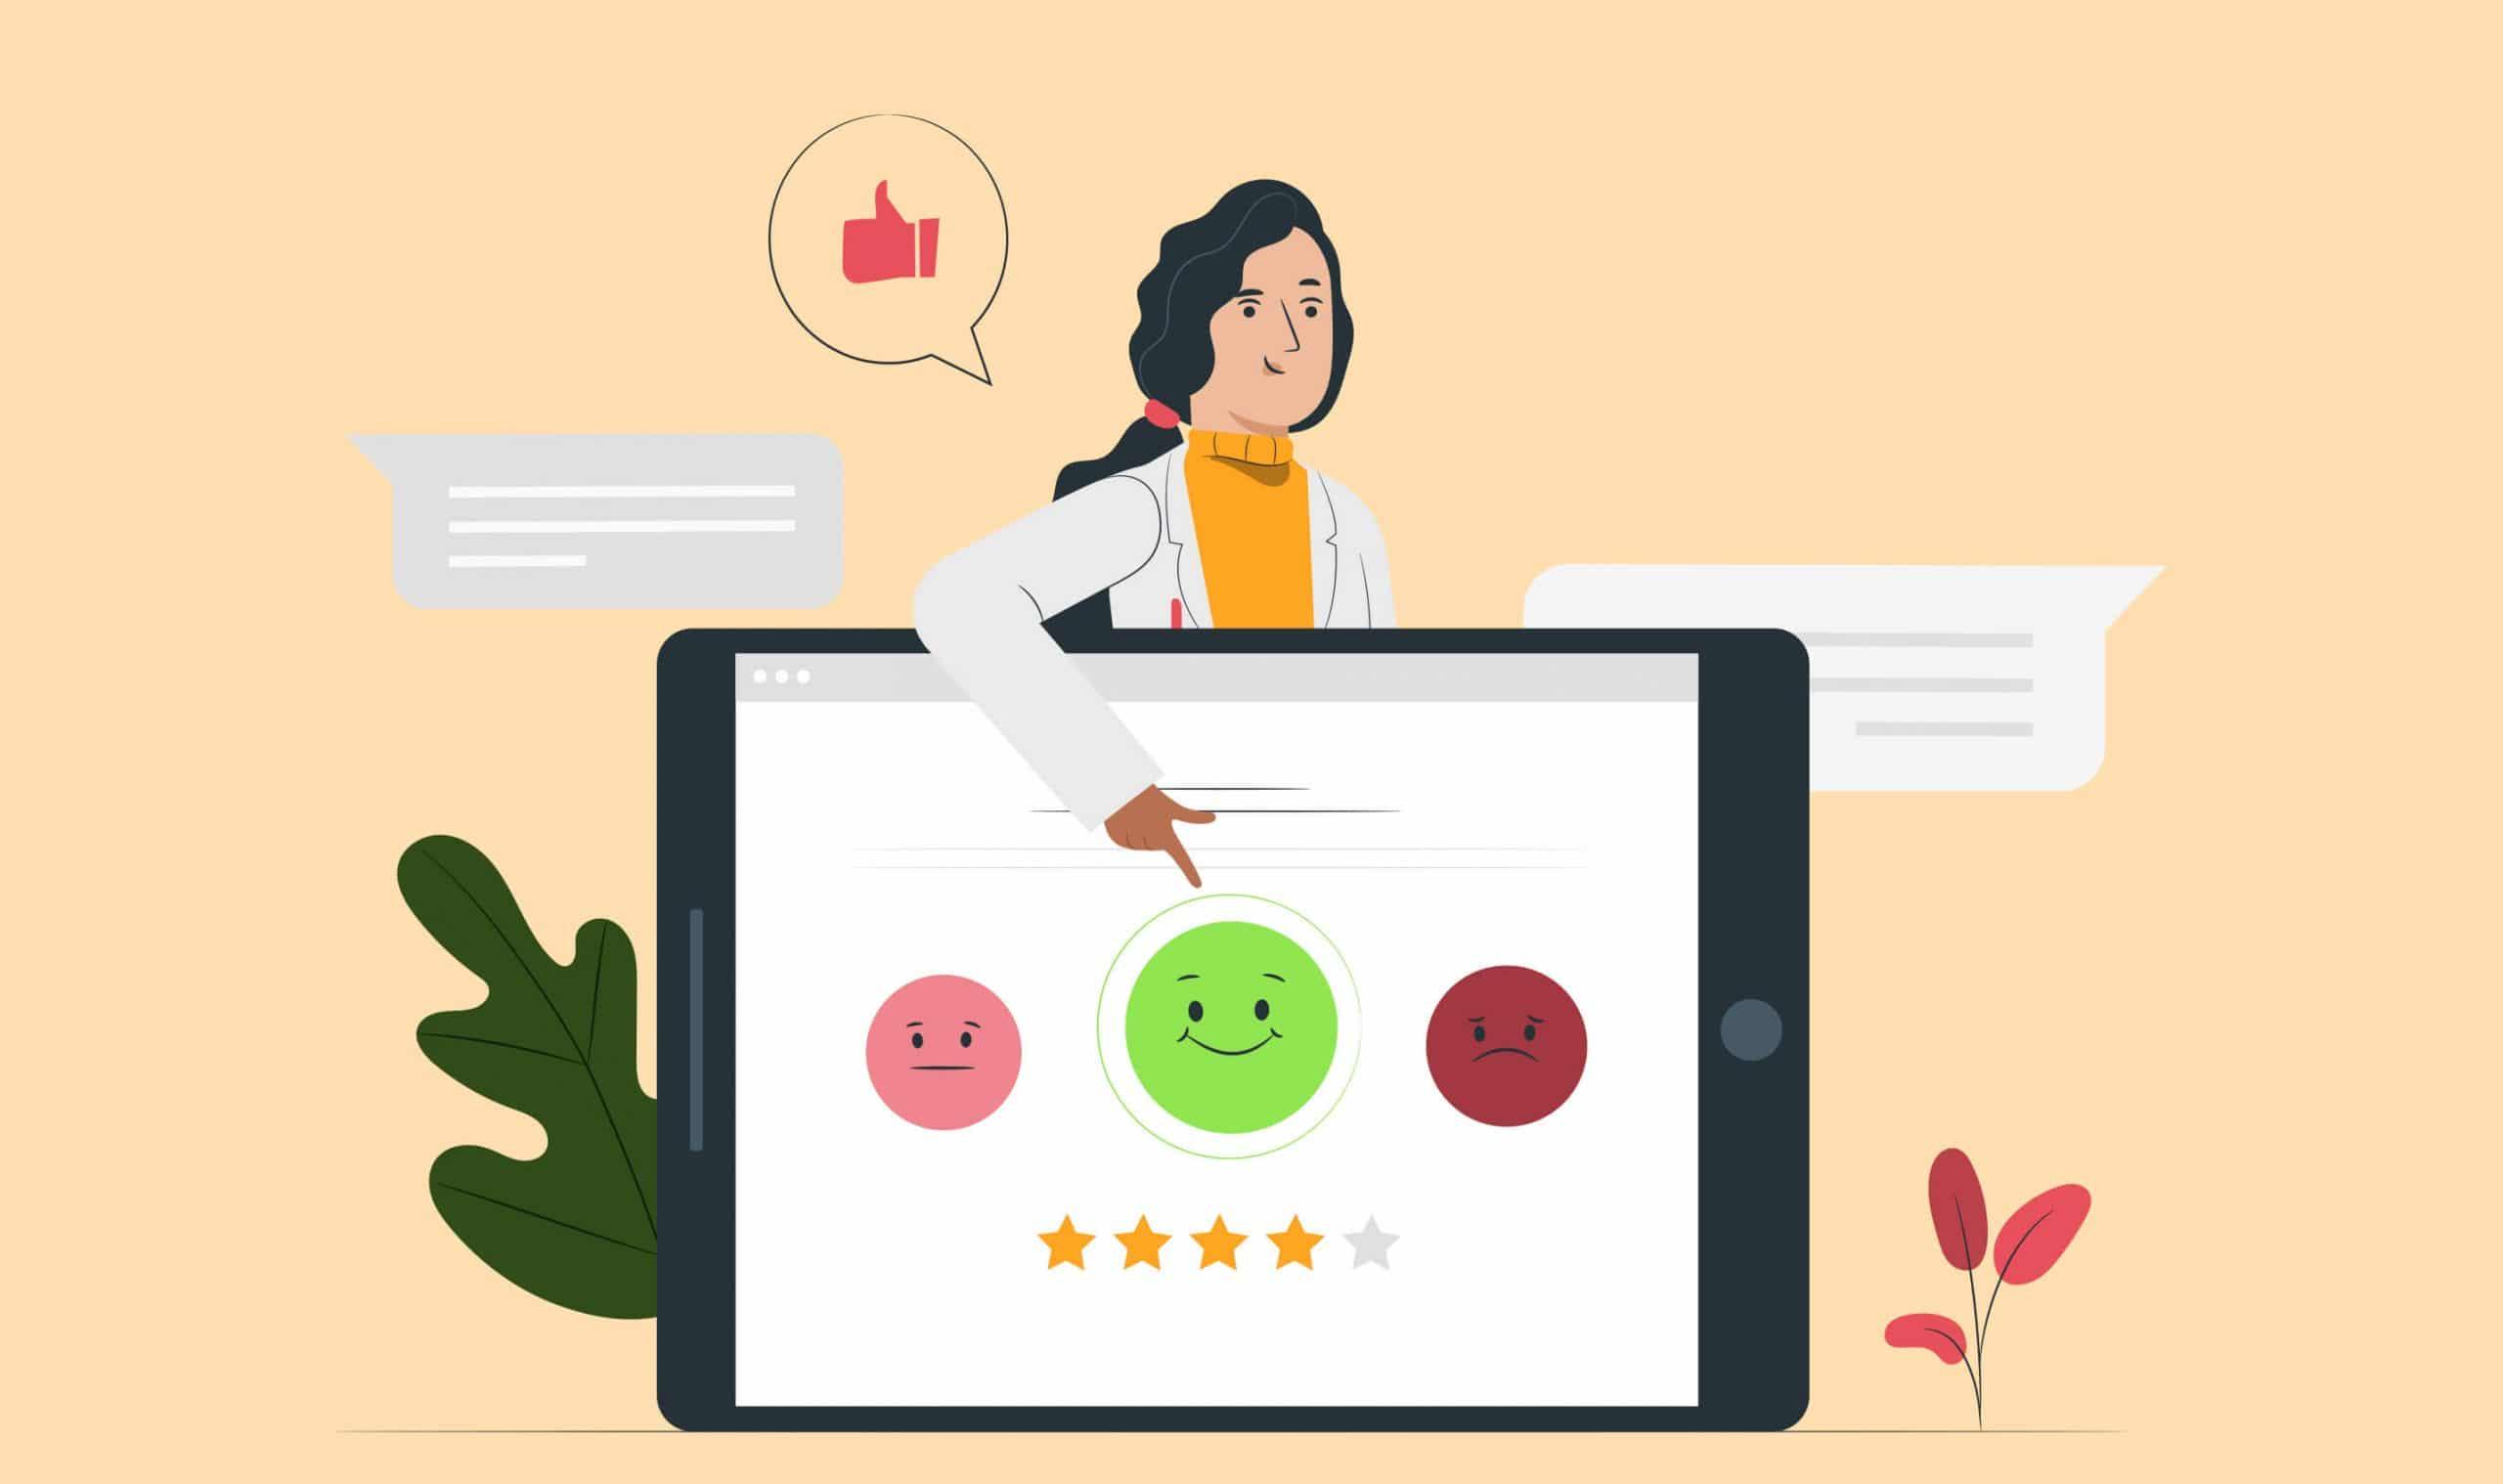 Best practices for patient satisfaction survey